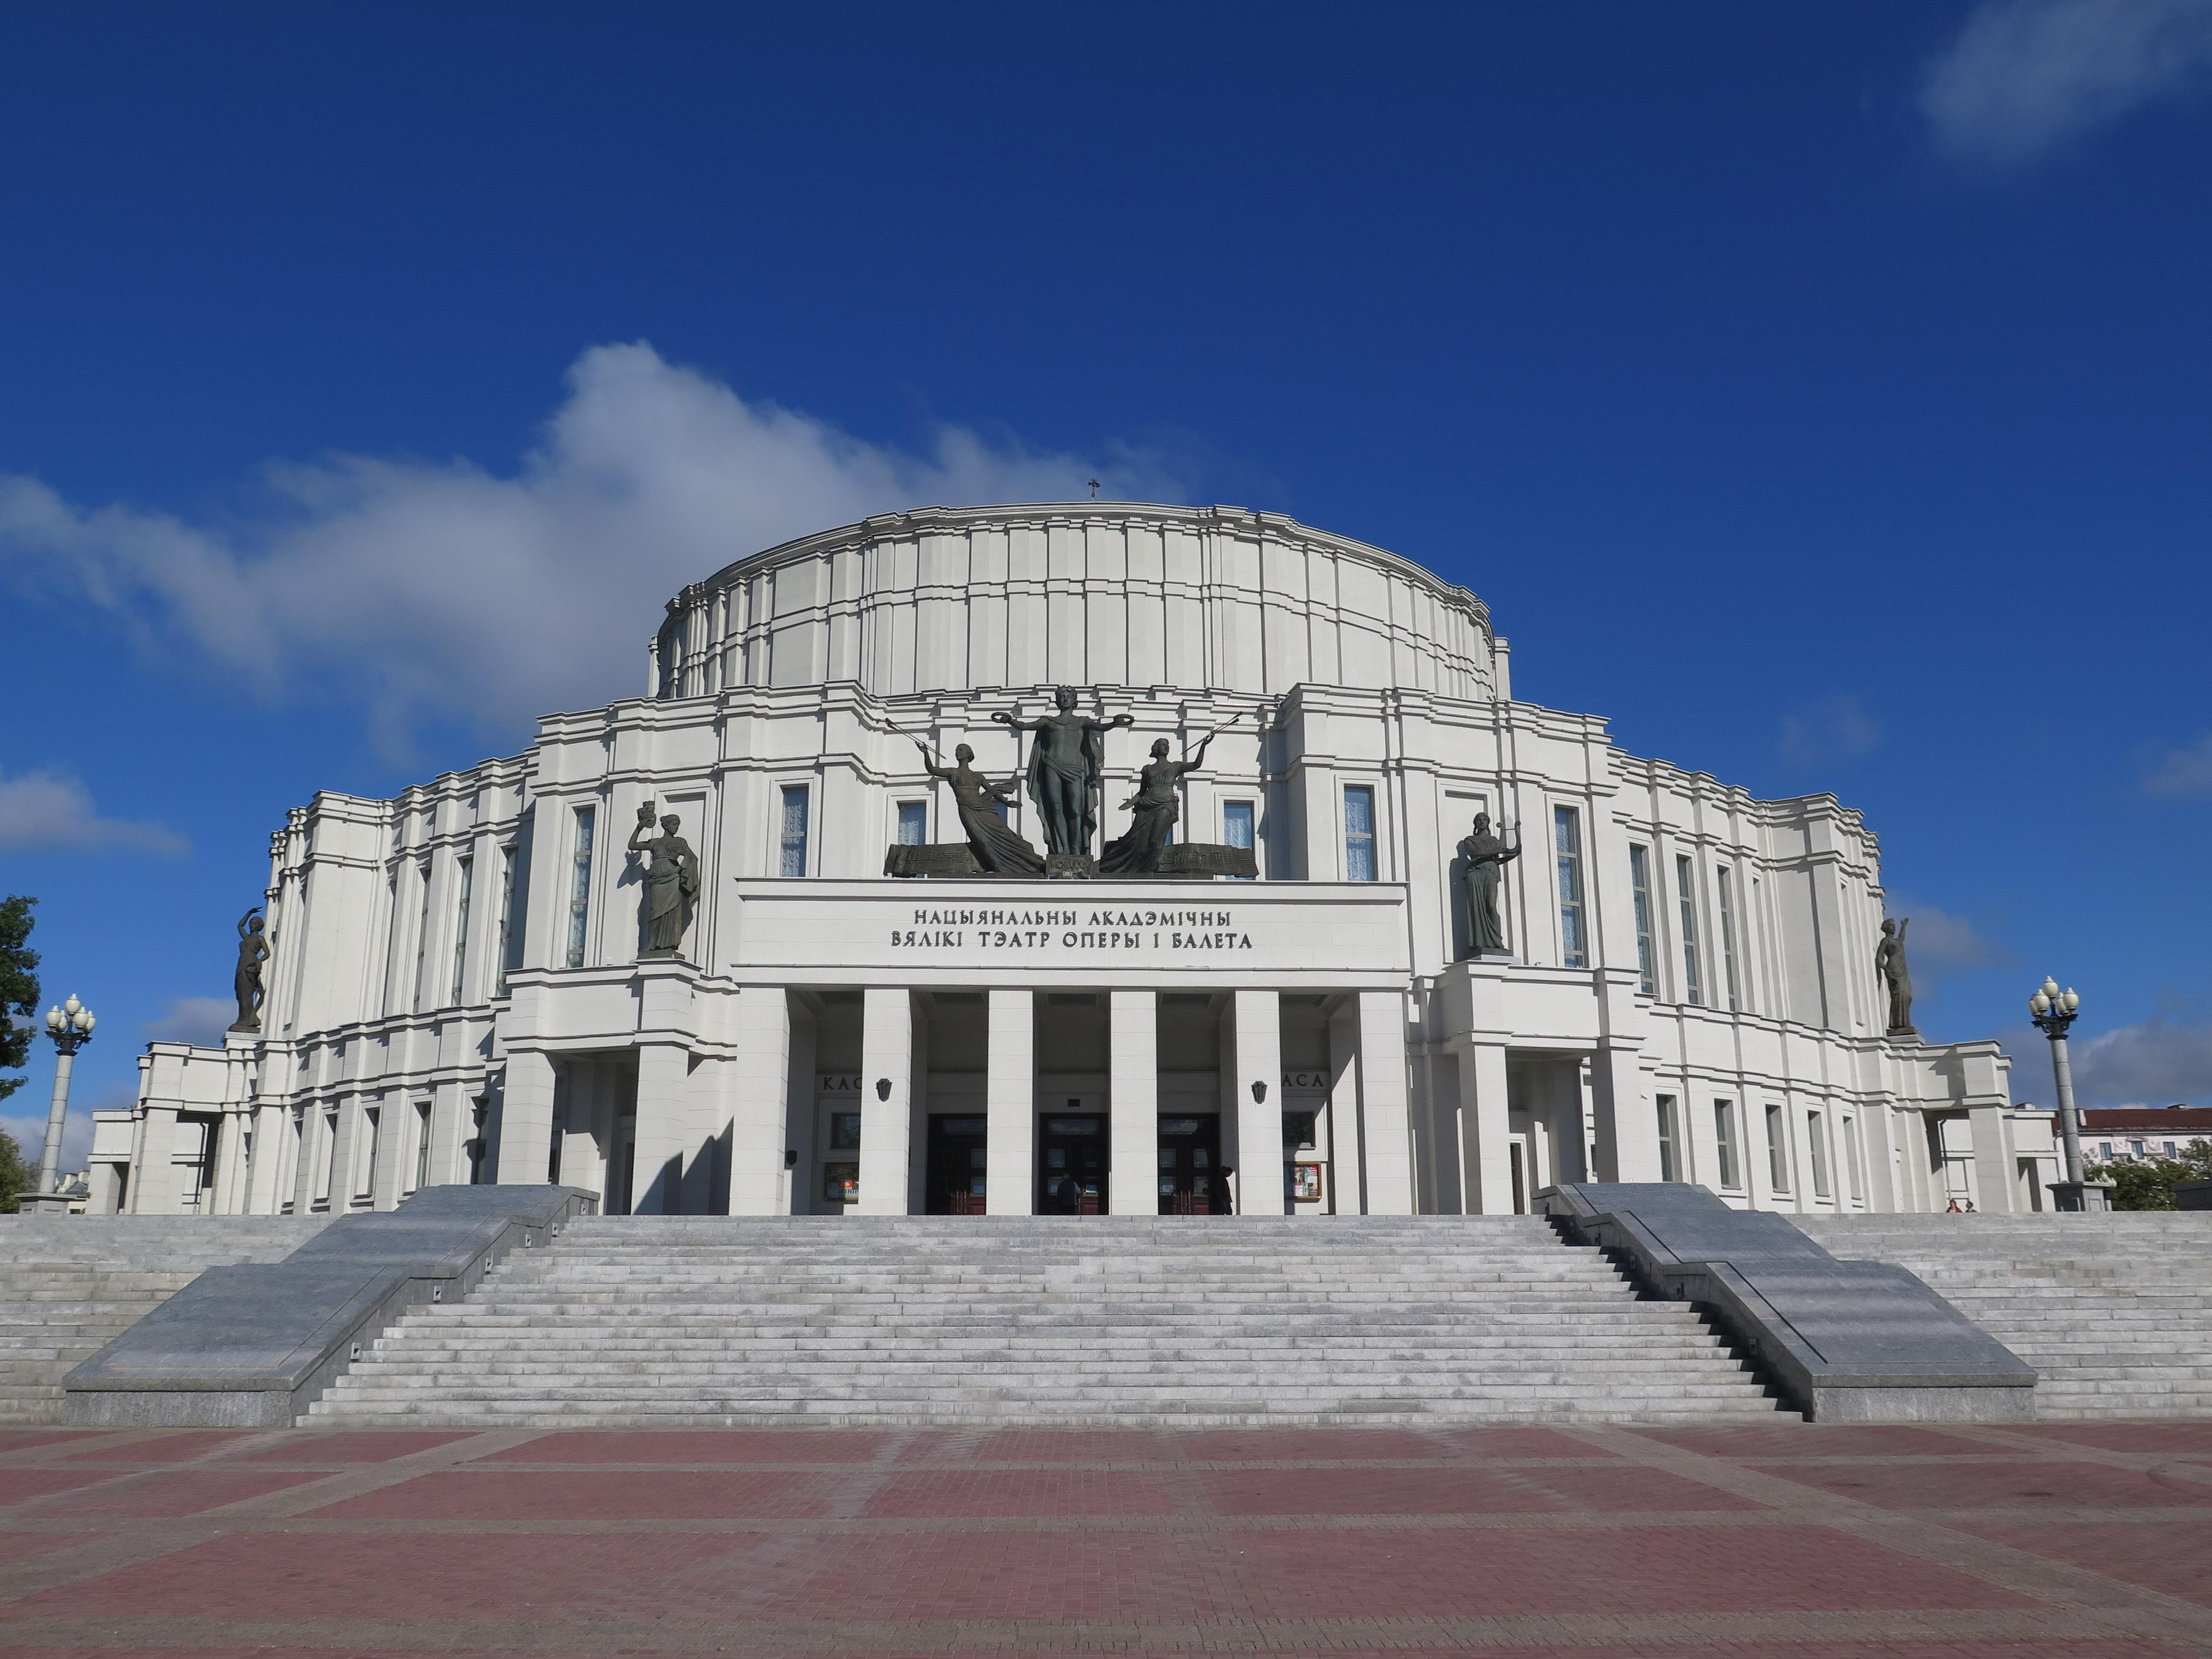 The Minsk Opera House. Beautiful and grand.